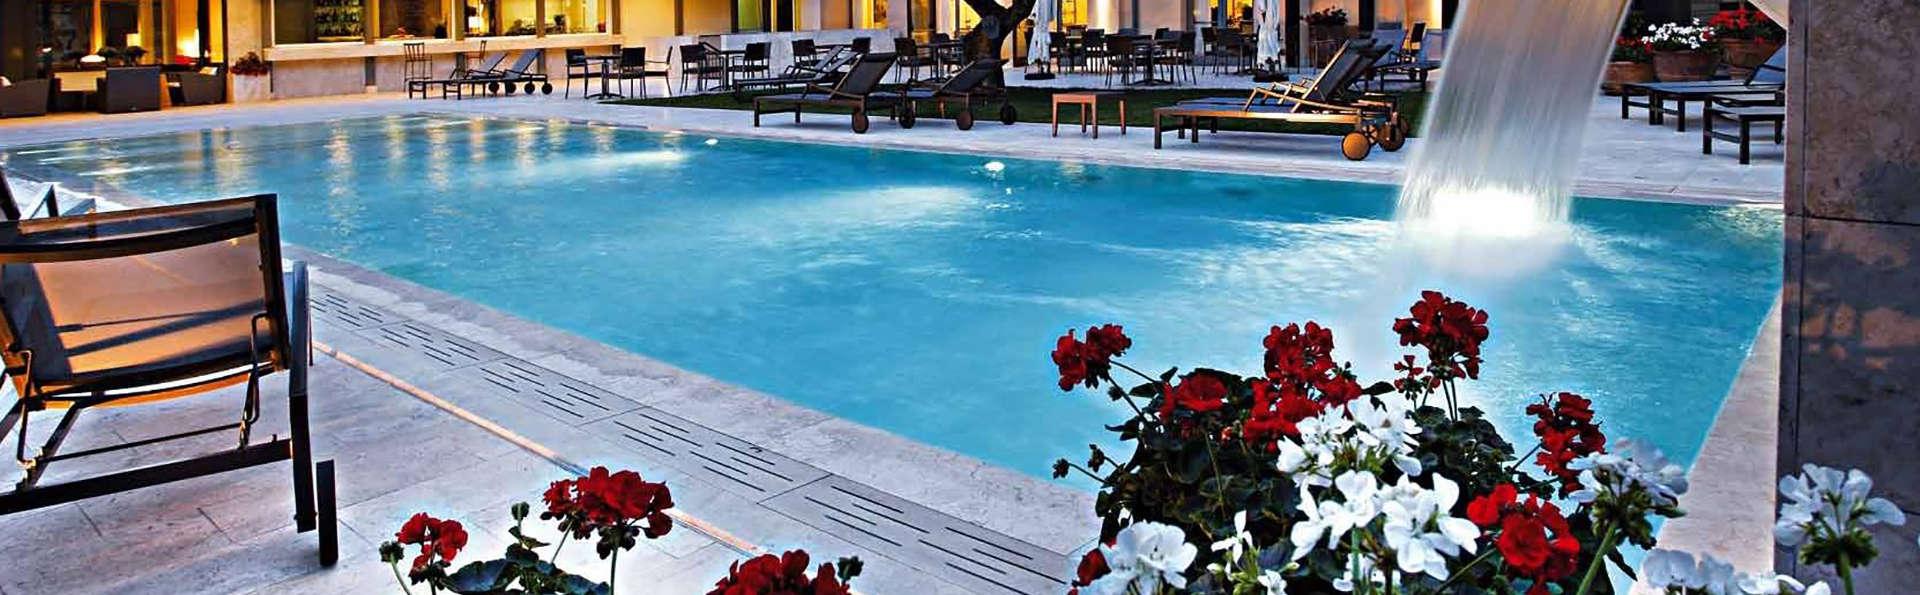 Grand Hotel Croce di Malta - Edit_Pool.jpg